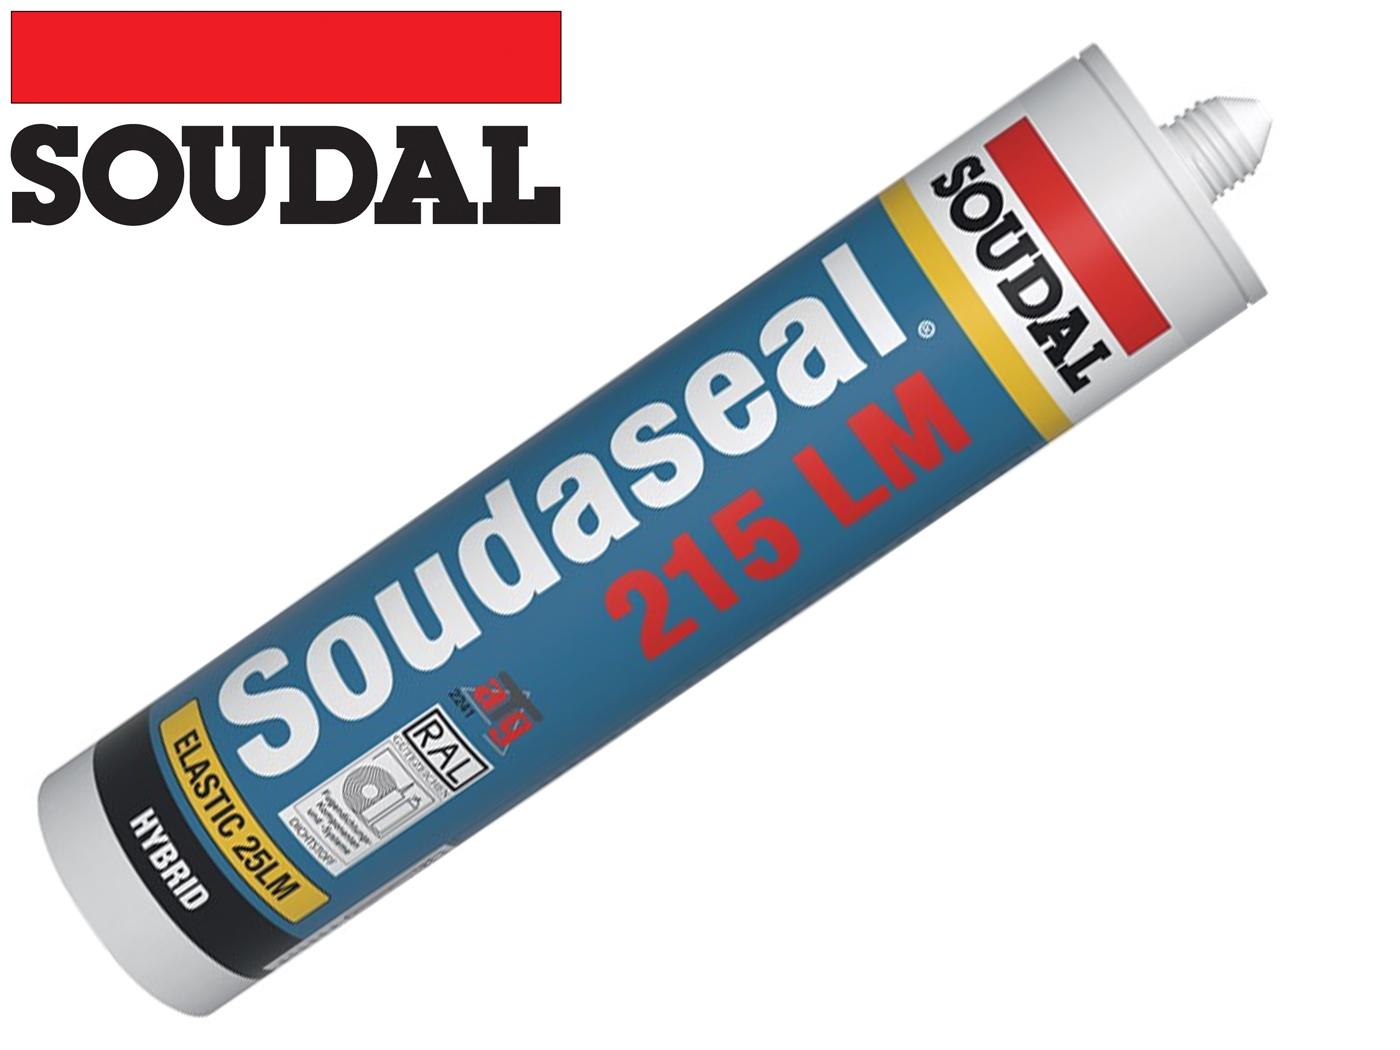 SOUDASEAL 215 LM afdichtingskit 290 ml wit